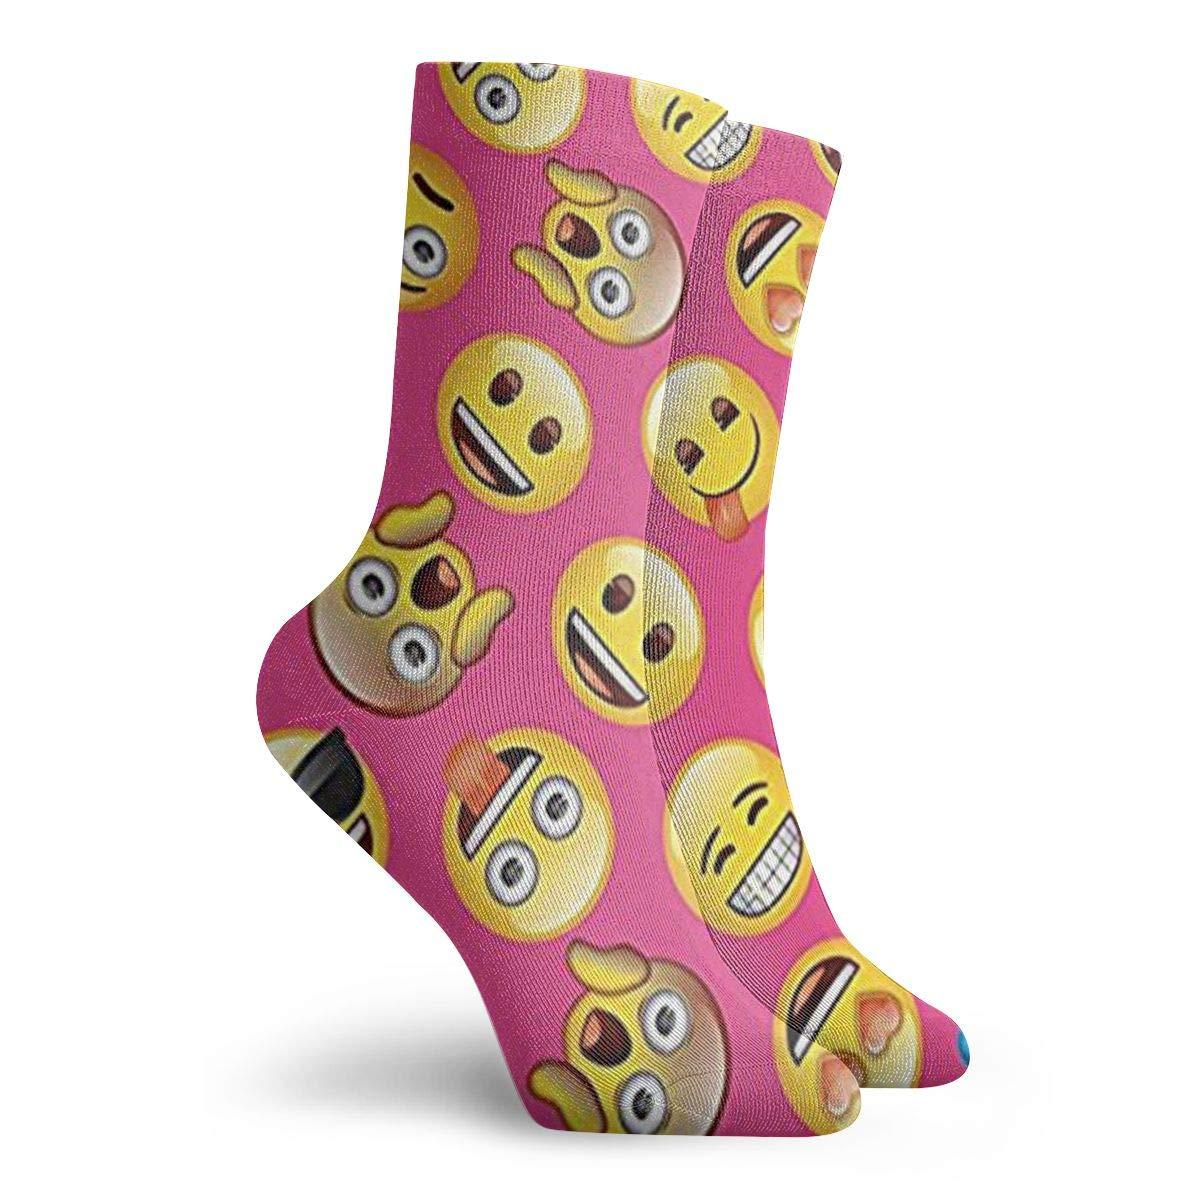 Emoji Unisex Funny Casual Crew Socks Athletic Socks For Boys Girls Kids Teenagers